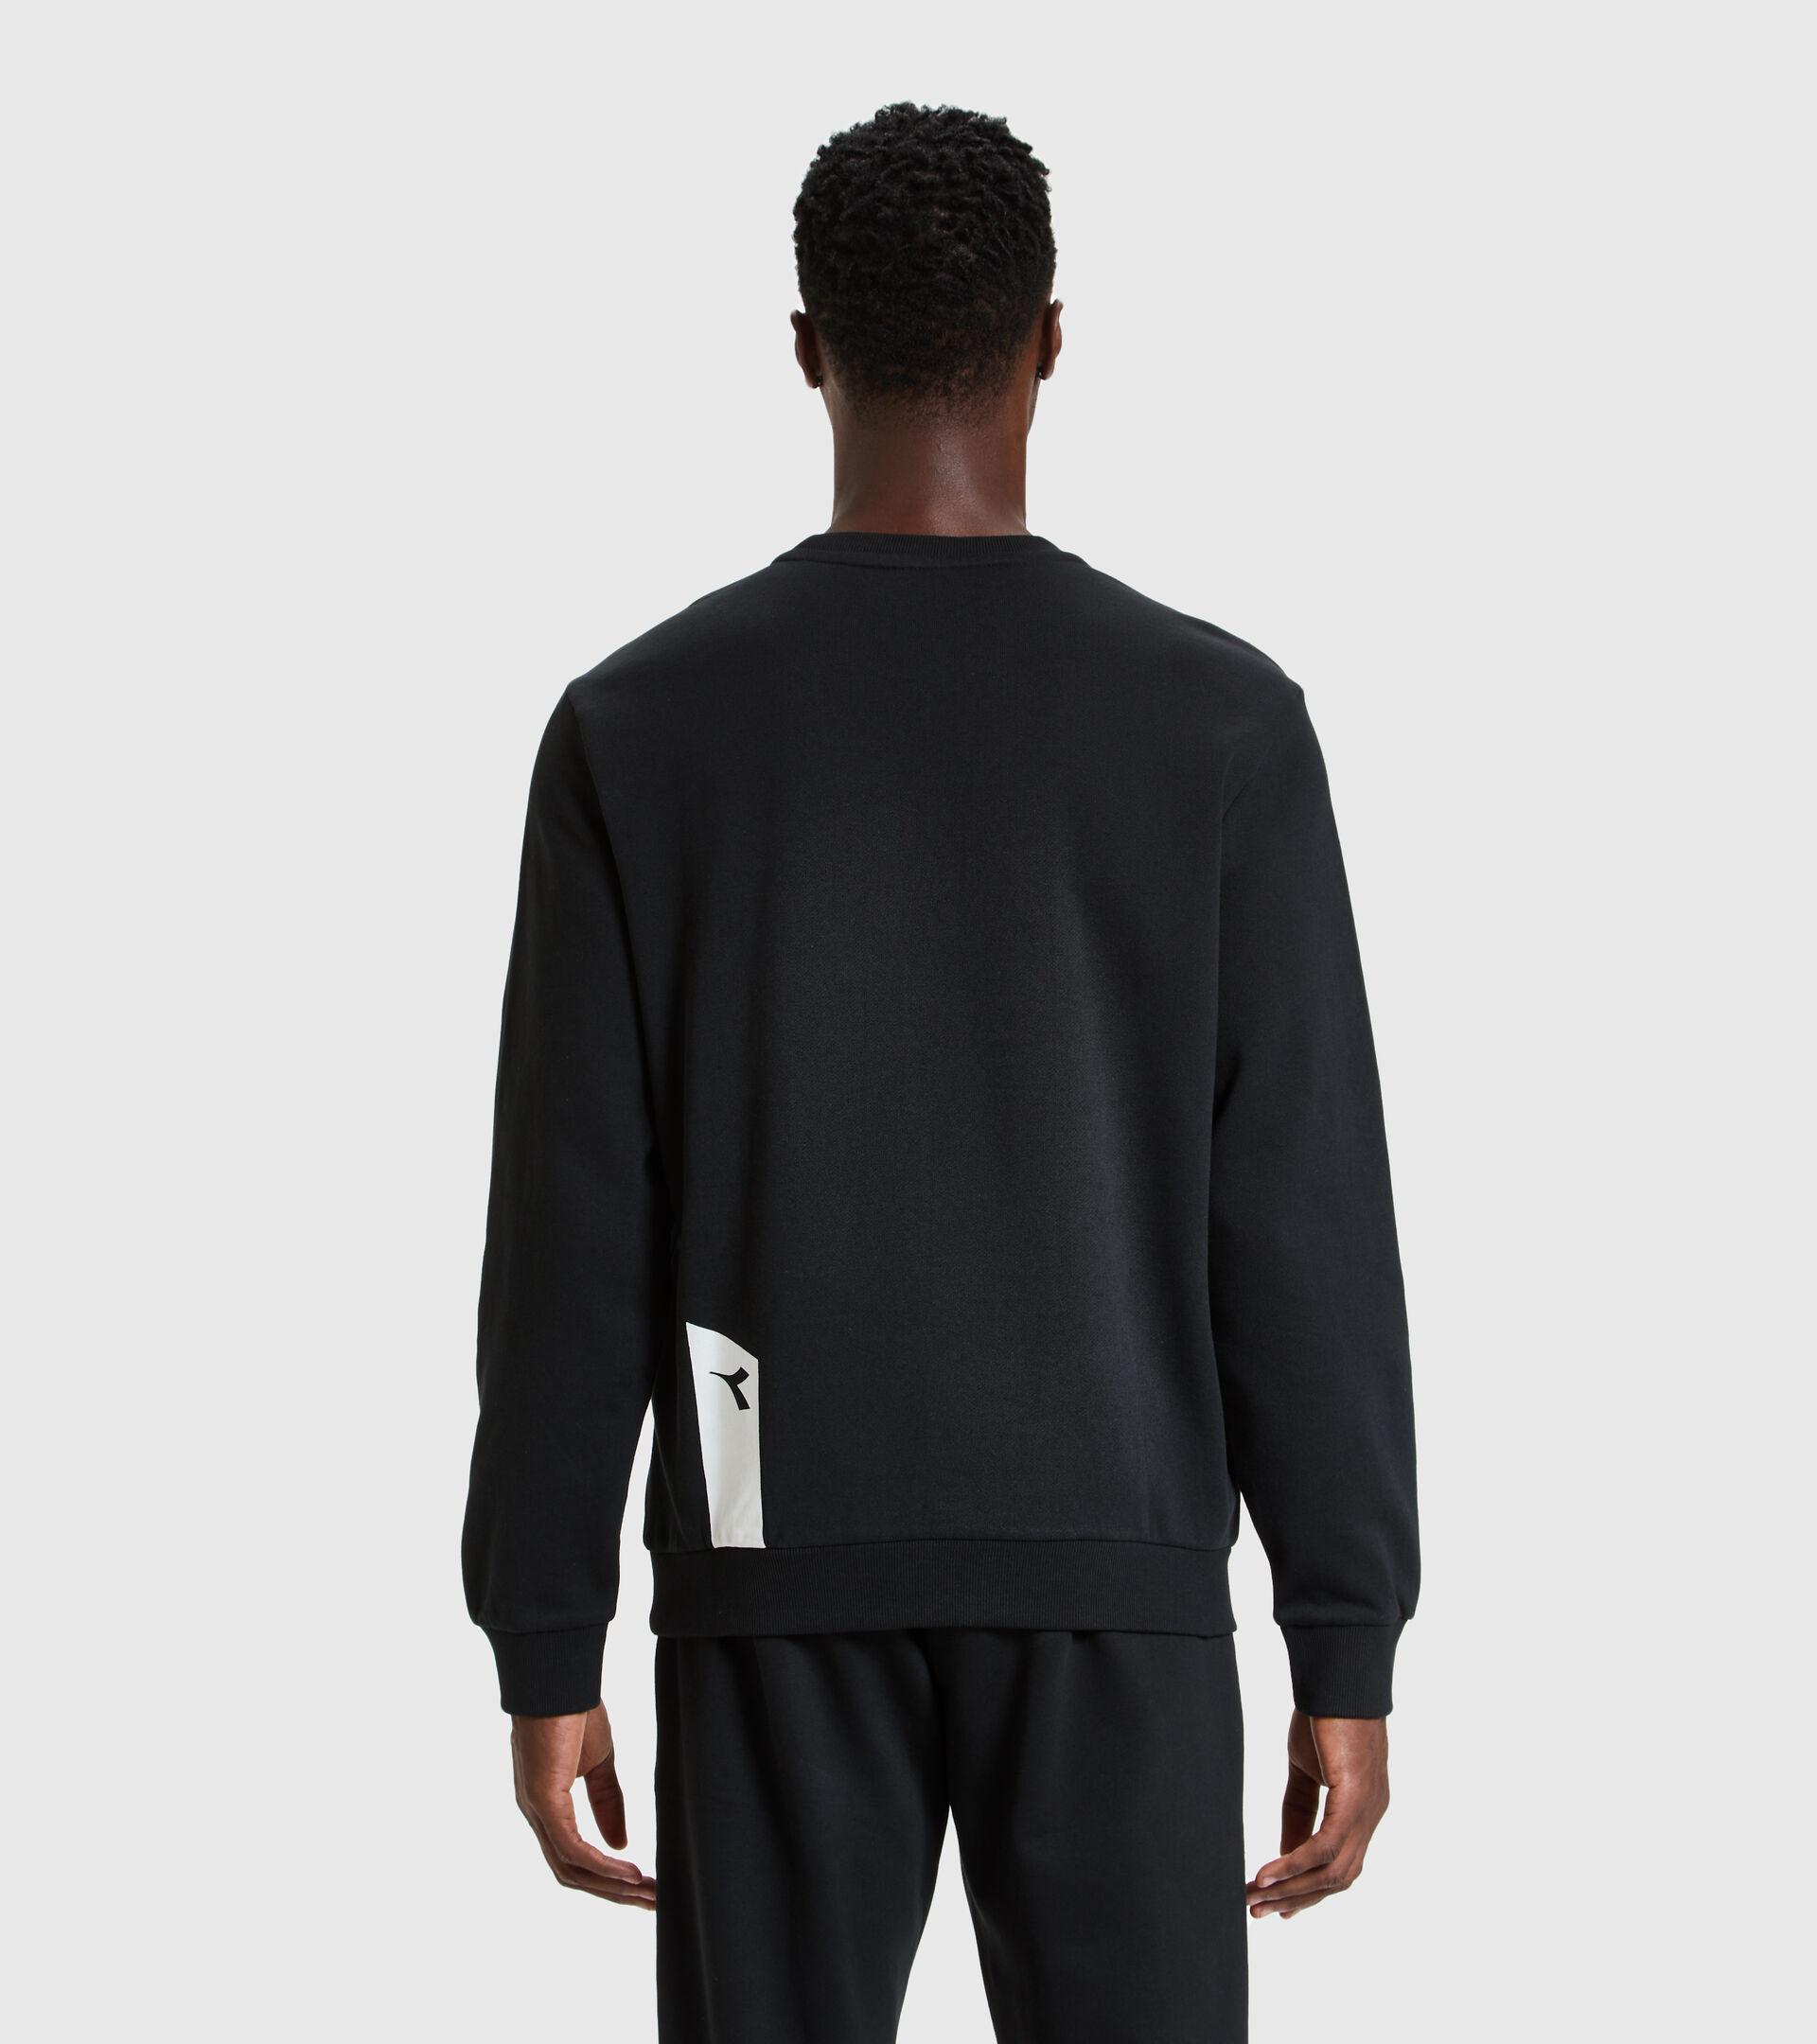 Crew-neck sweatshirt - Unisex SWEATSHIRT CREW ICON DARK SMOKE/WHITE/BLUE FLUO - Diadora